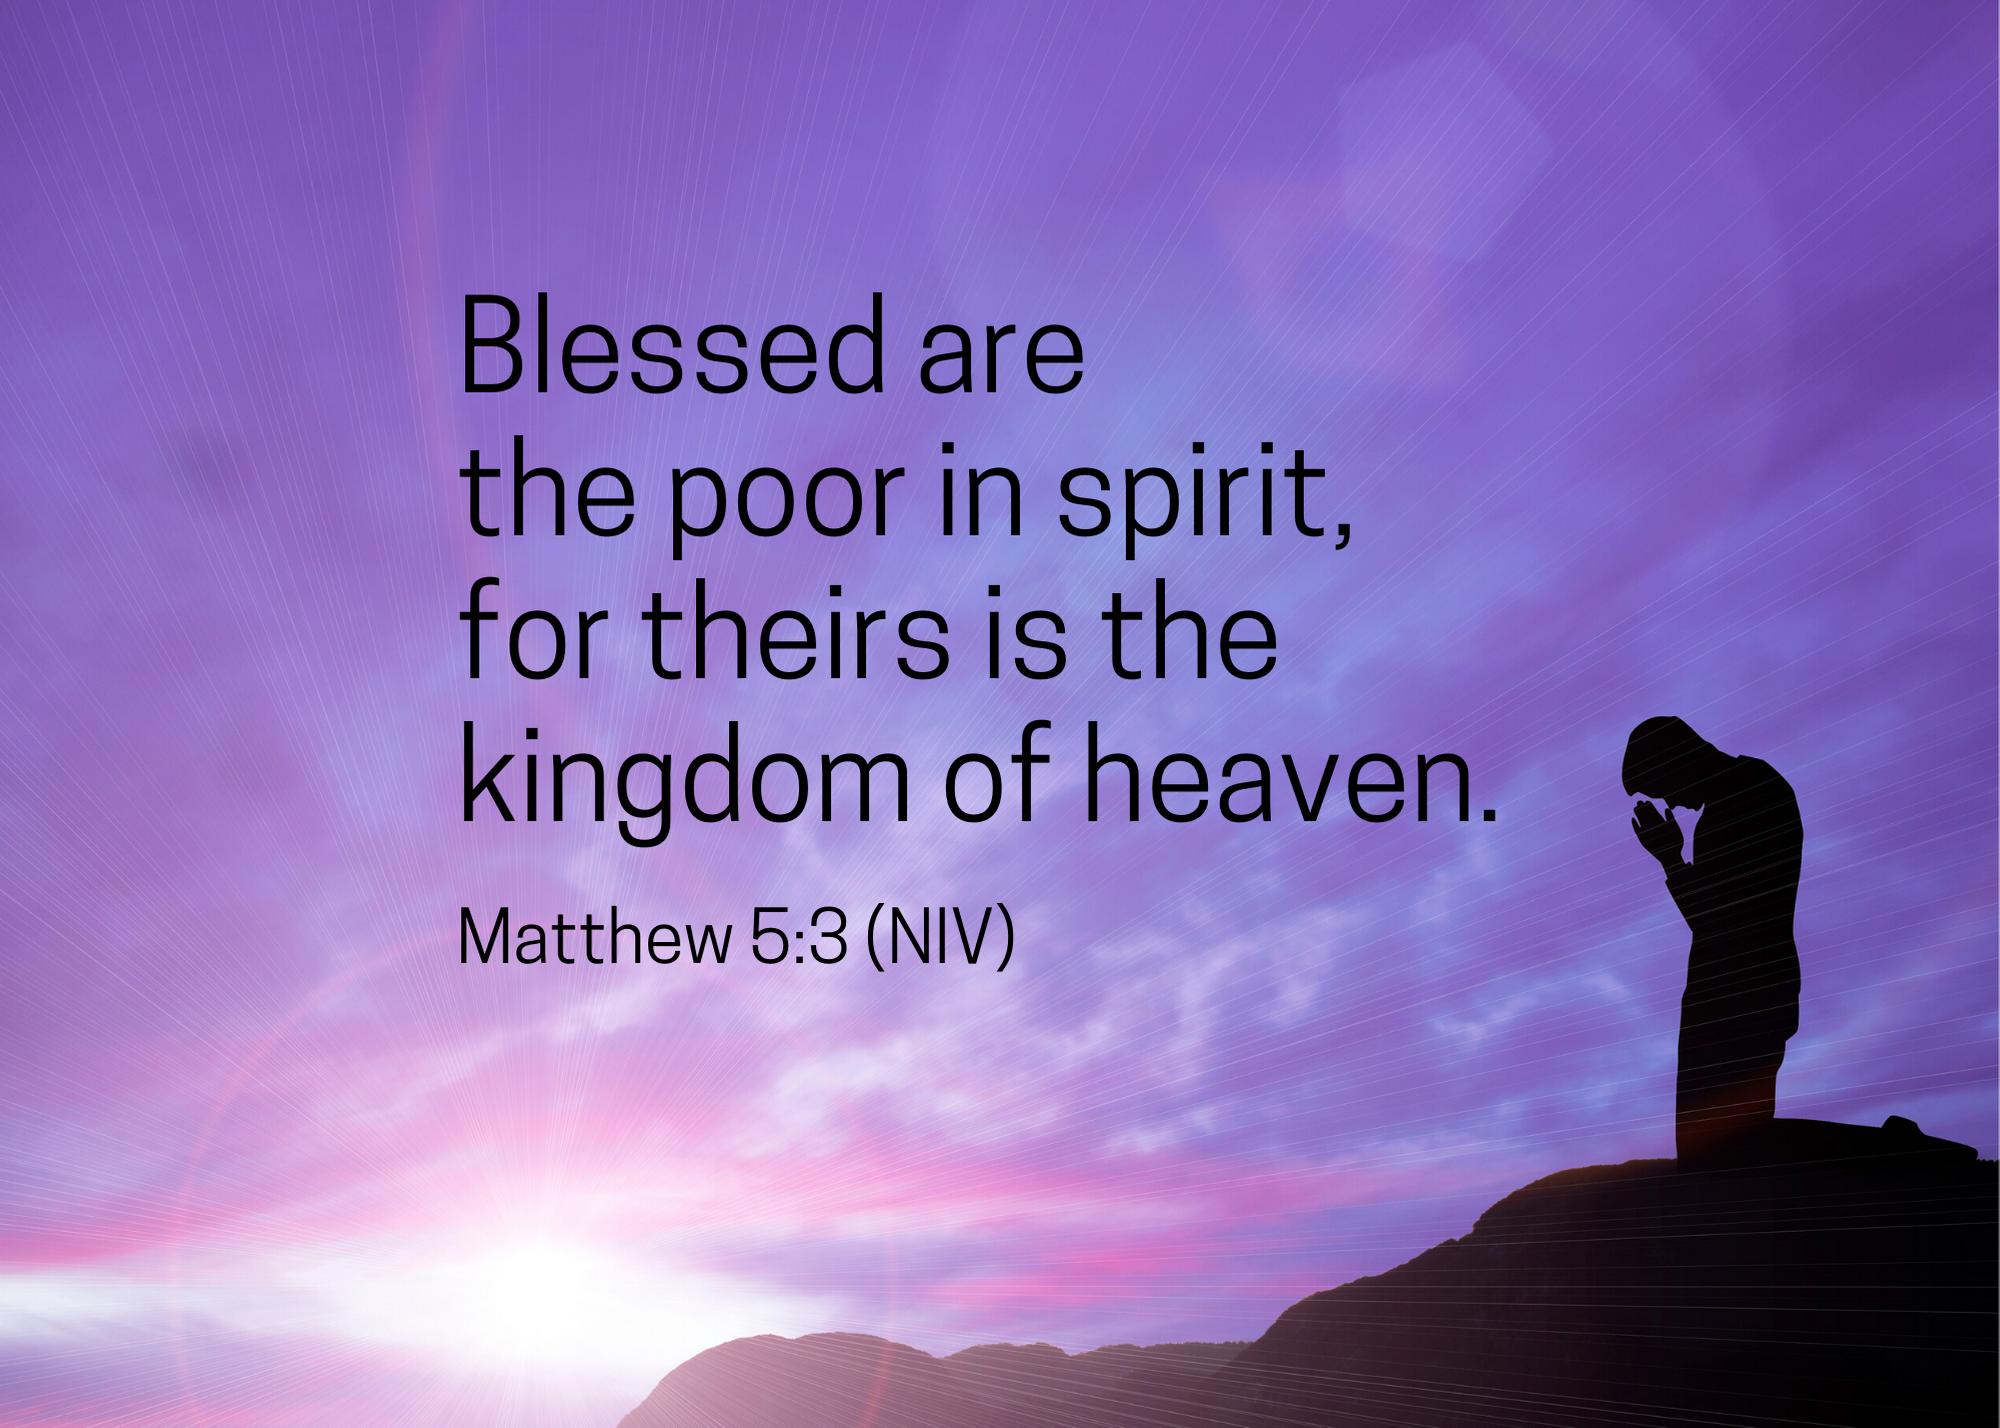 Matthew 5 3 niv